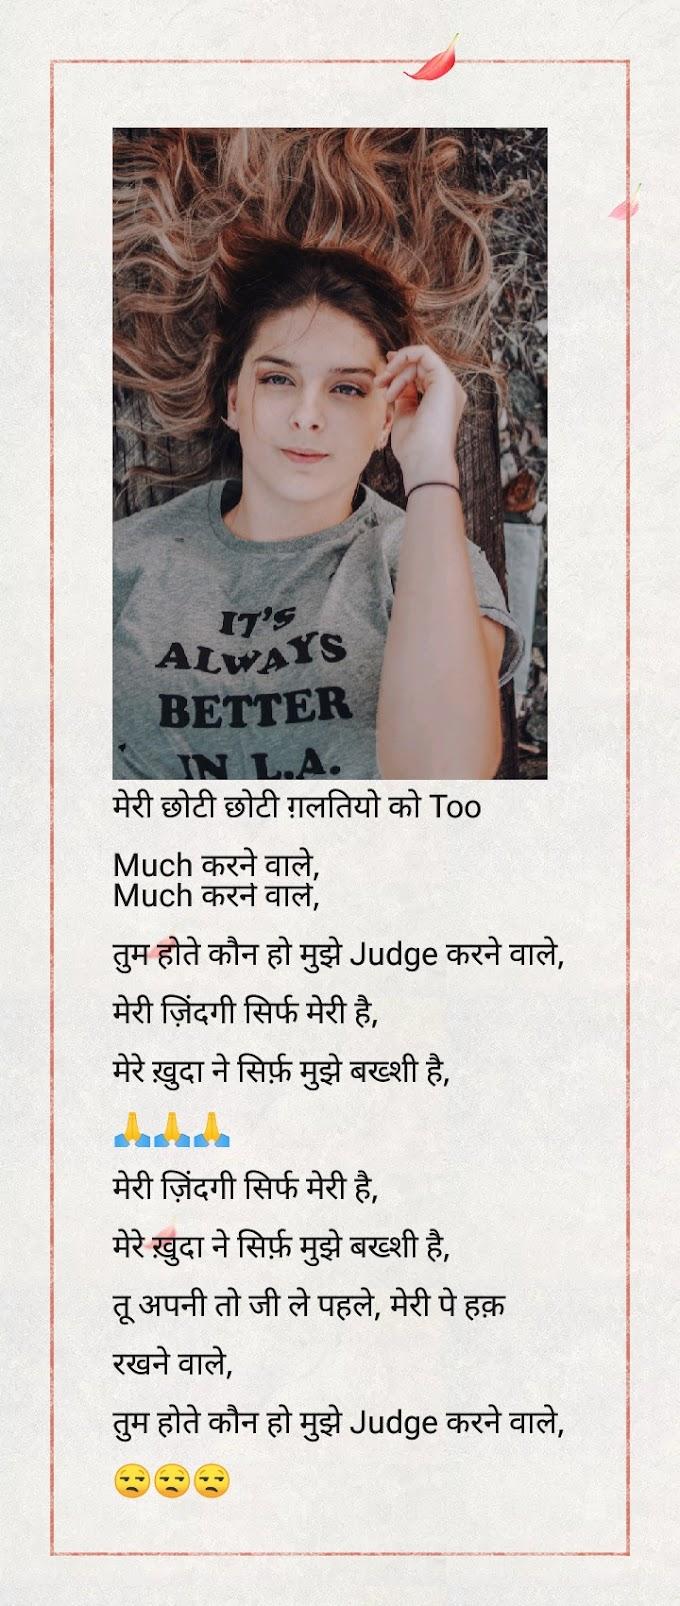 Tum Hote Kaun ho Mujhe Judge Karne Wale | तुम होते कौन हो मुझे जज करने वाले | Poetry in Hindi | Poetry